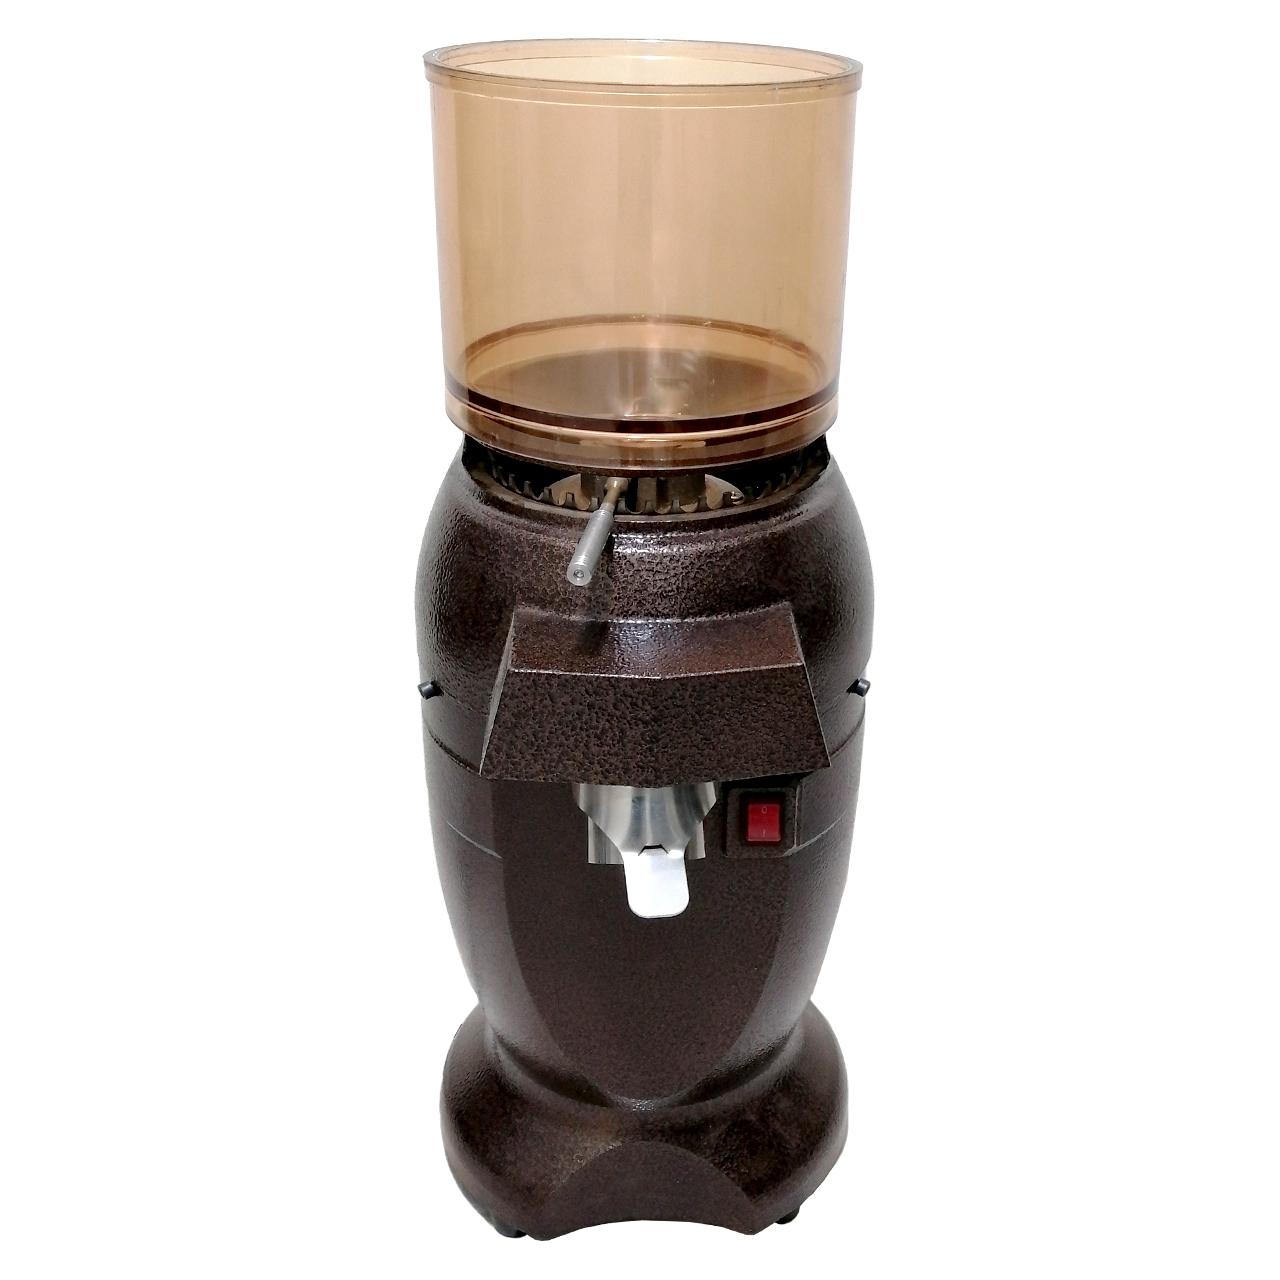 آسیاب قهوه طرح کوبان KB1